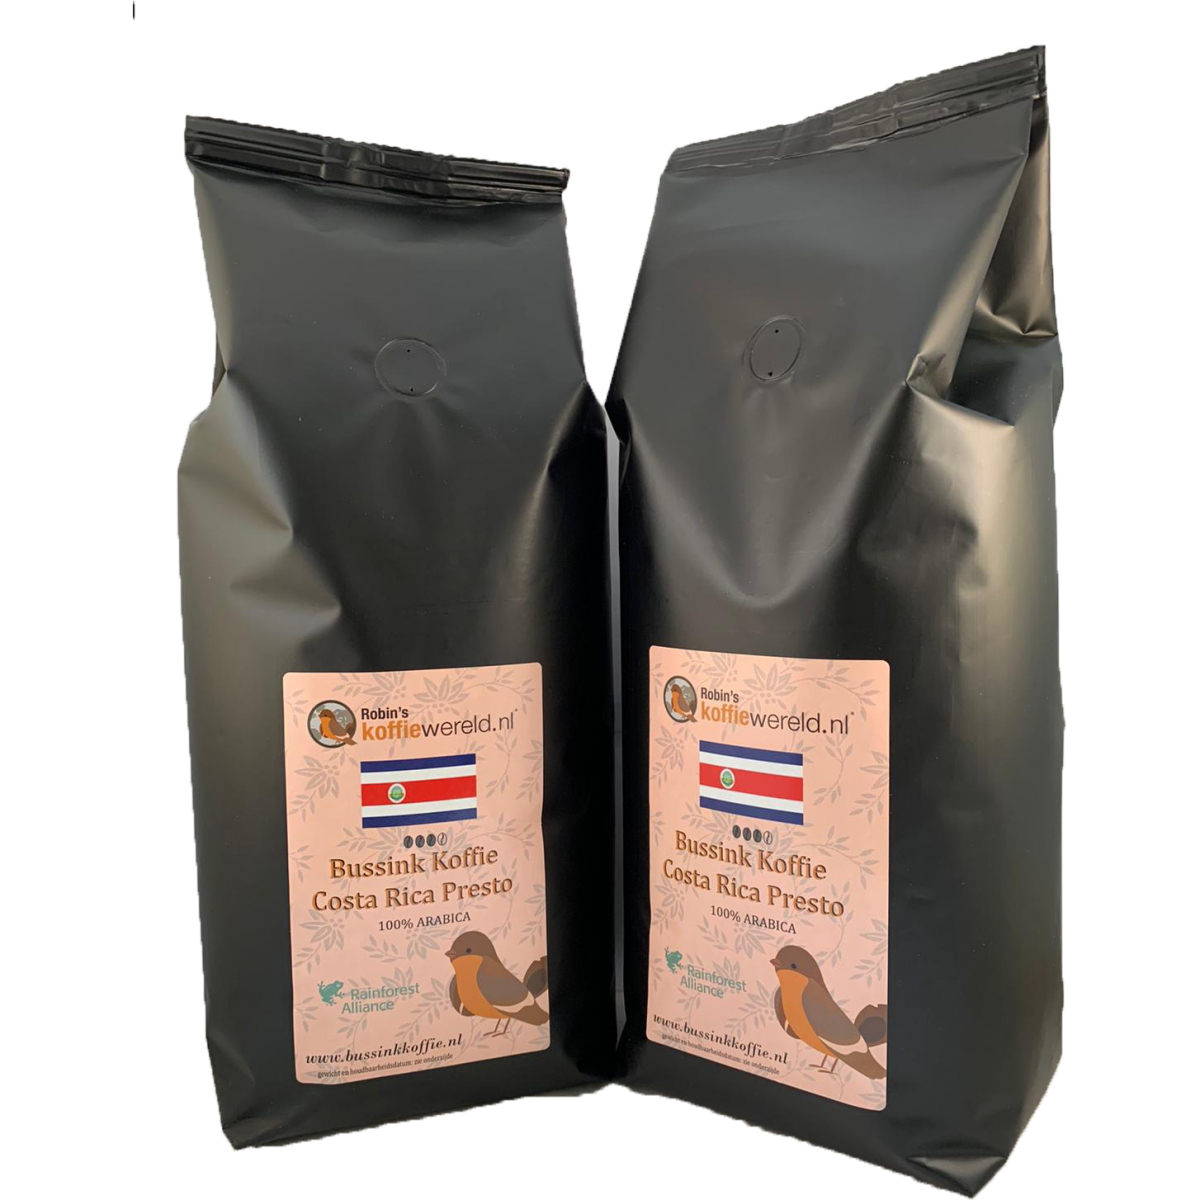 Bussink Koffie Costa Rica Presto 2 stuks 2020